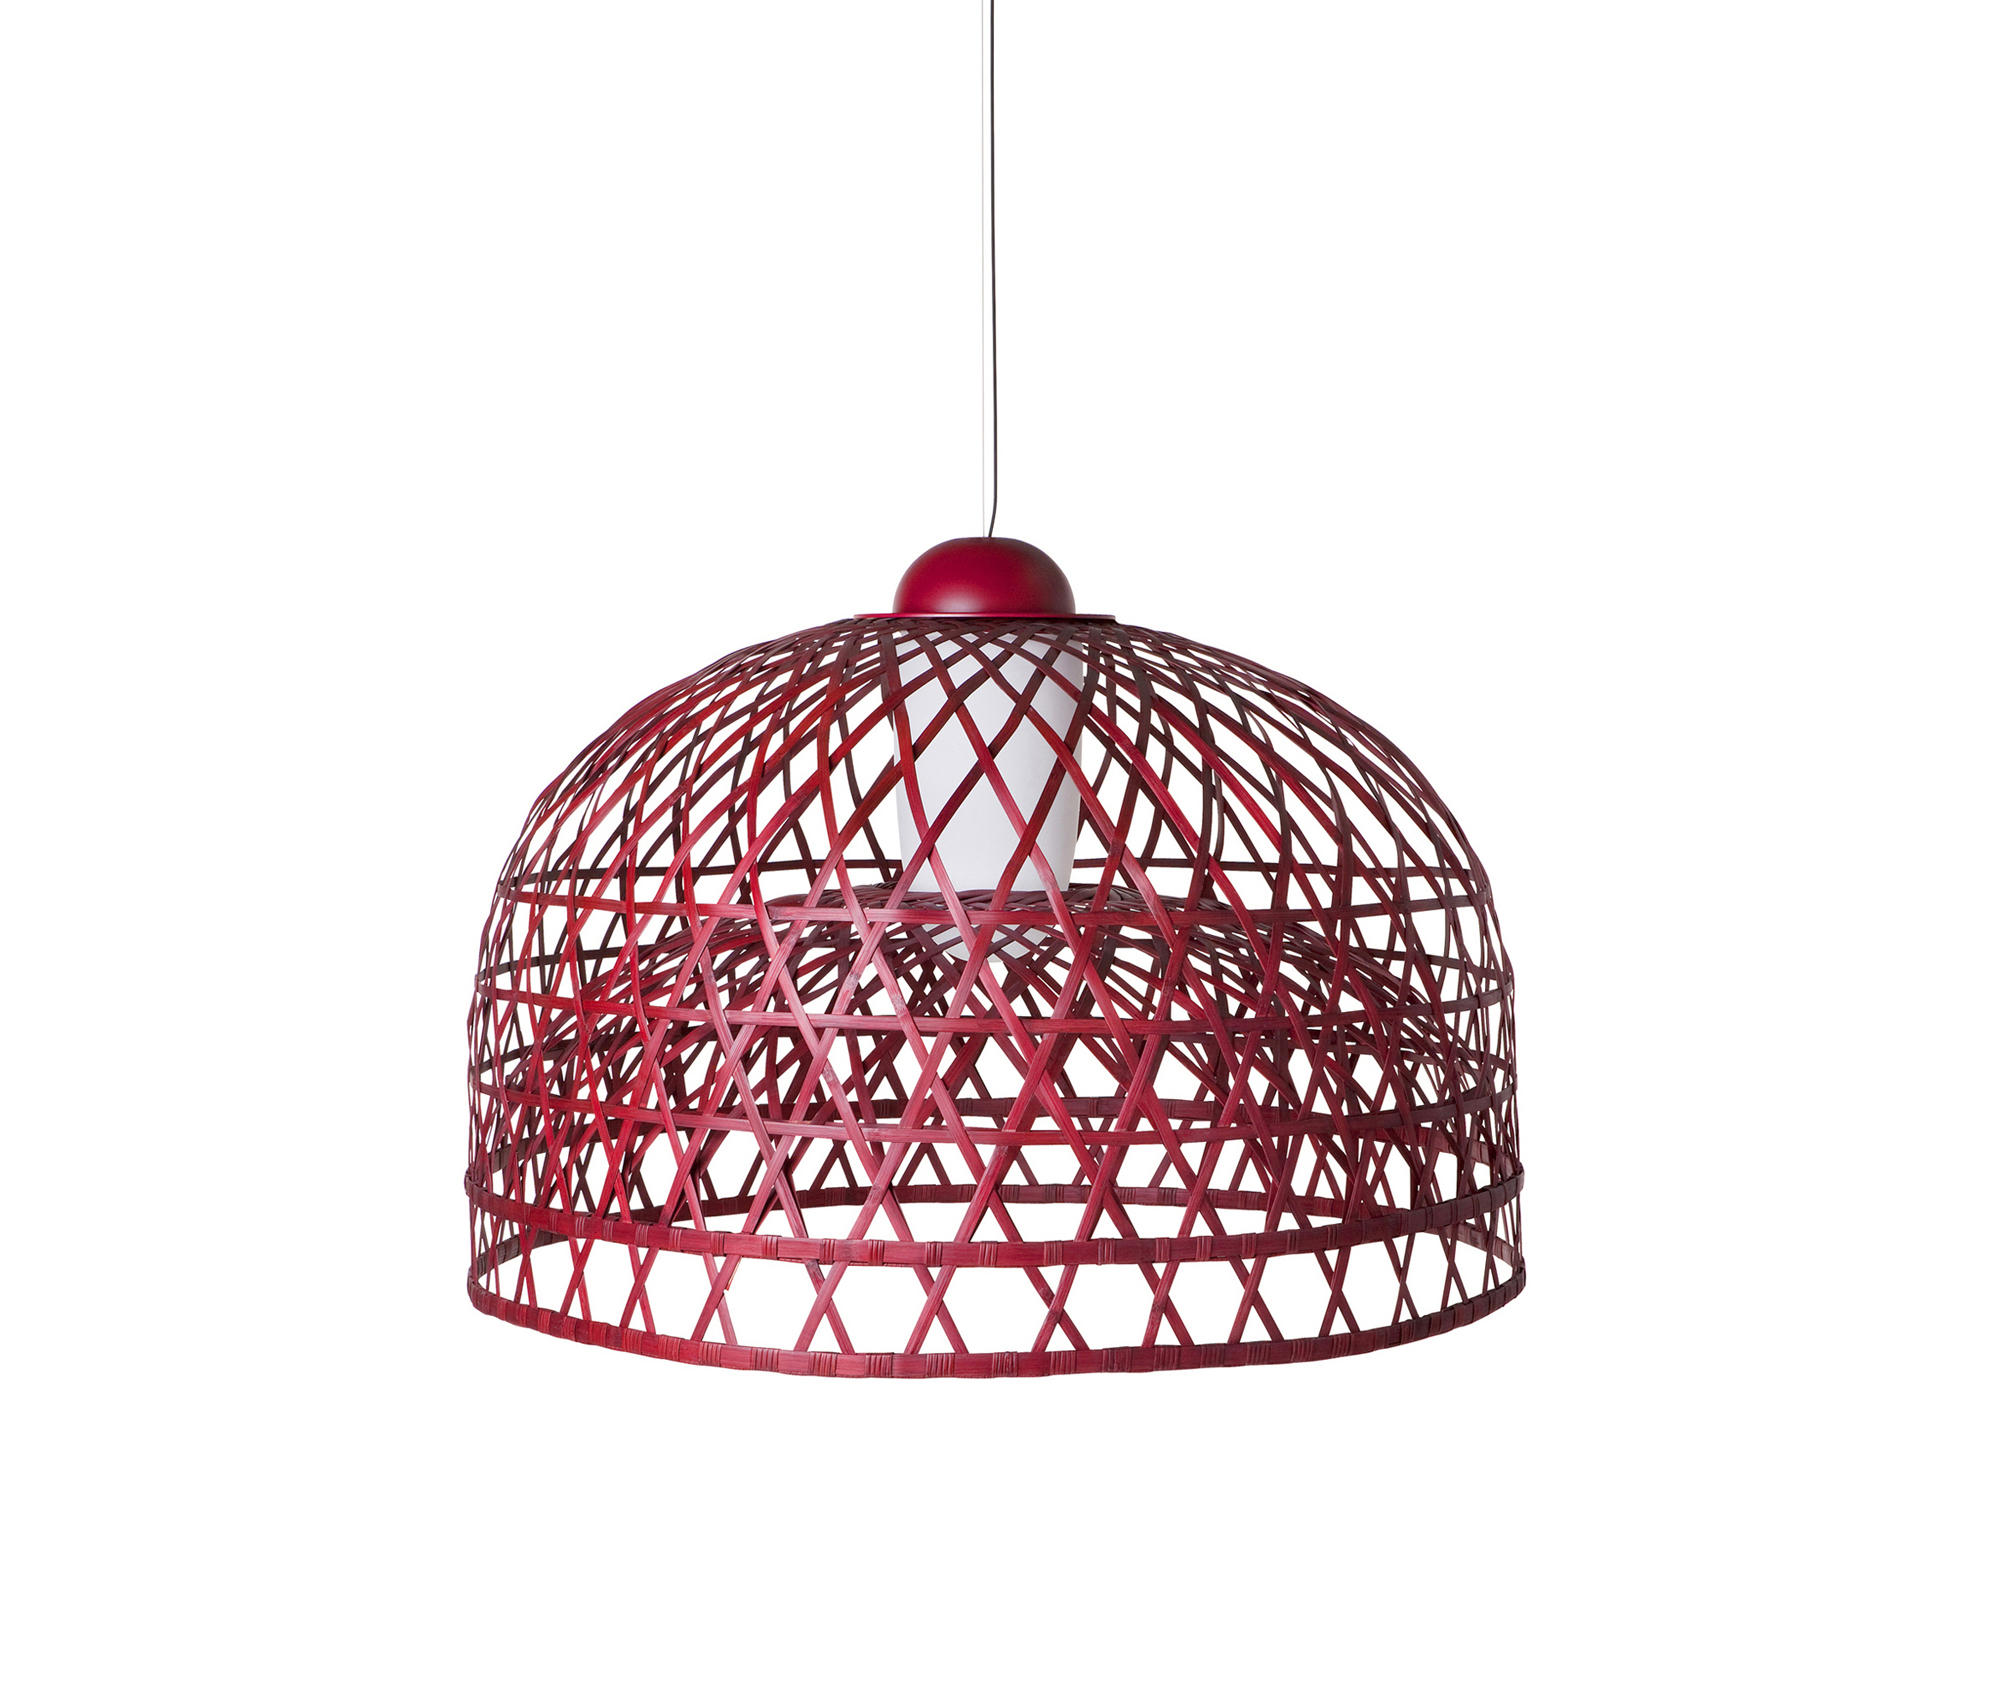 emperor suspended lamp large general lighting from moooi. Black Bedroom Furniture Sets. Home Design Ideas